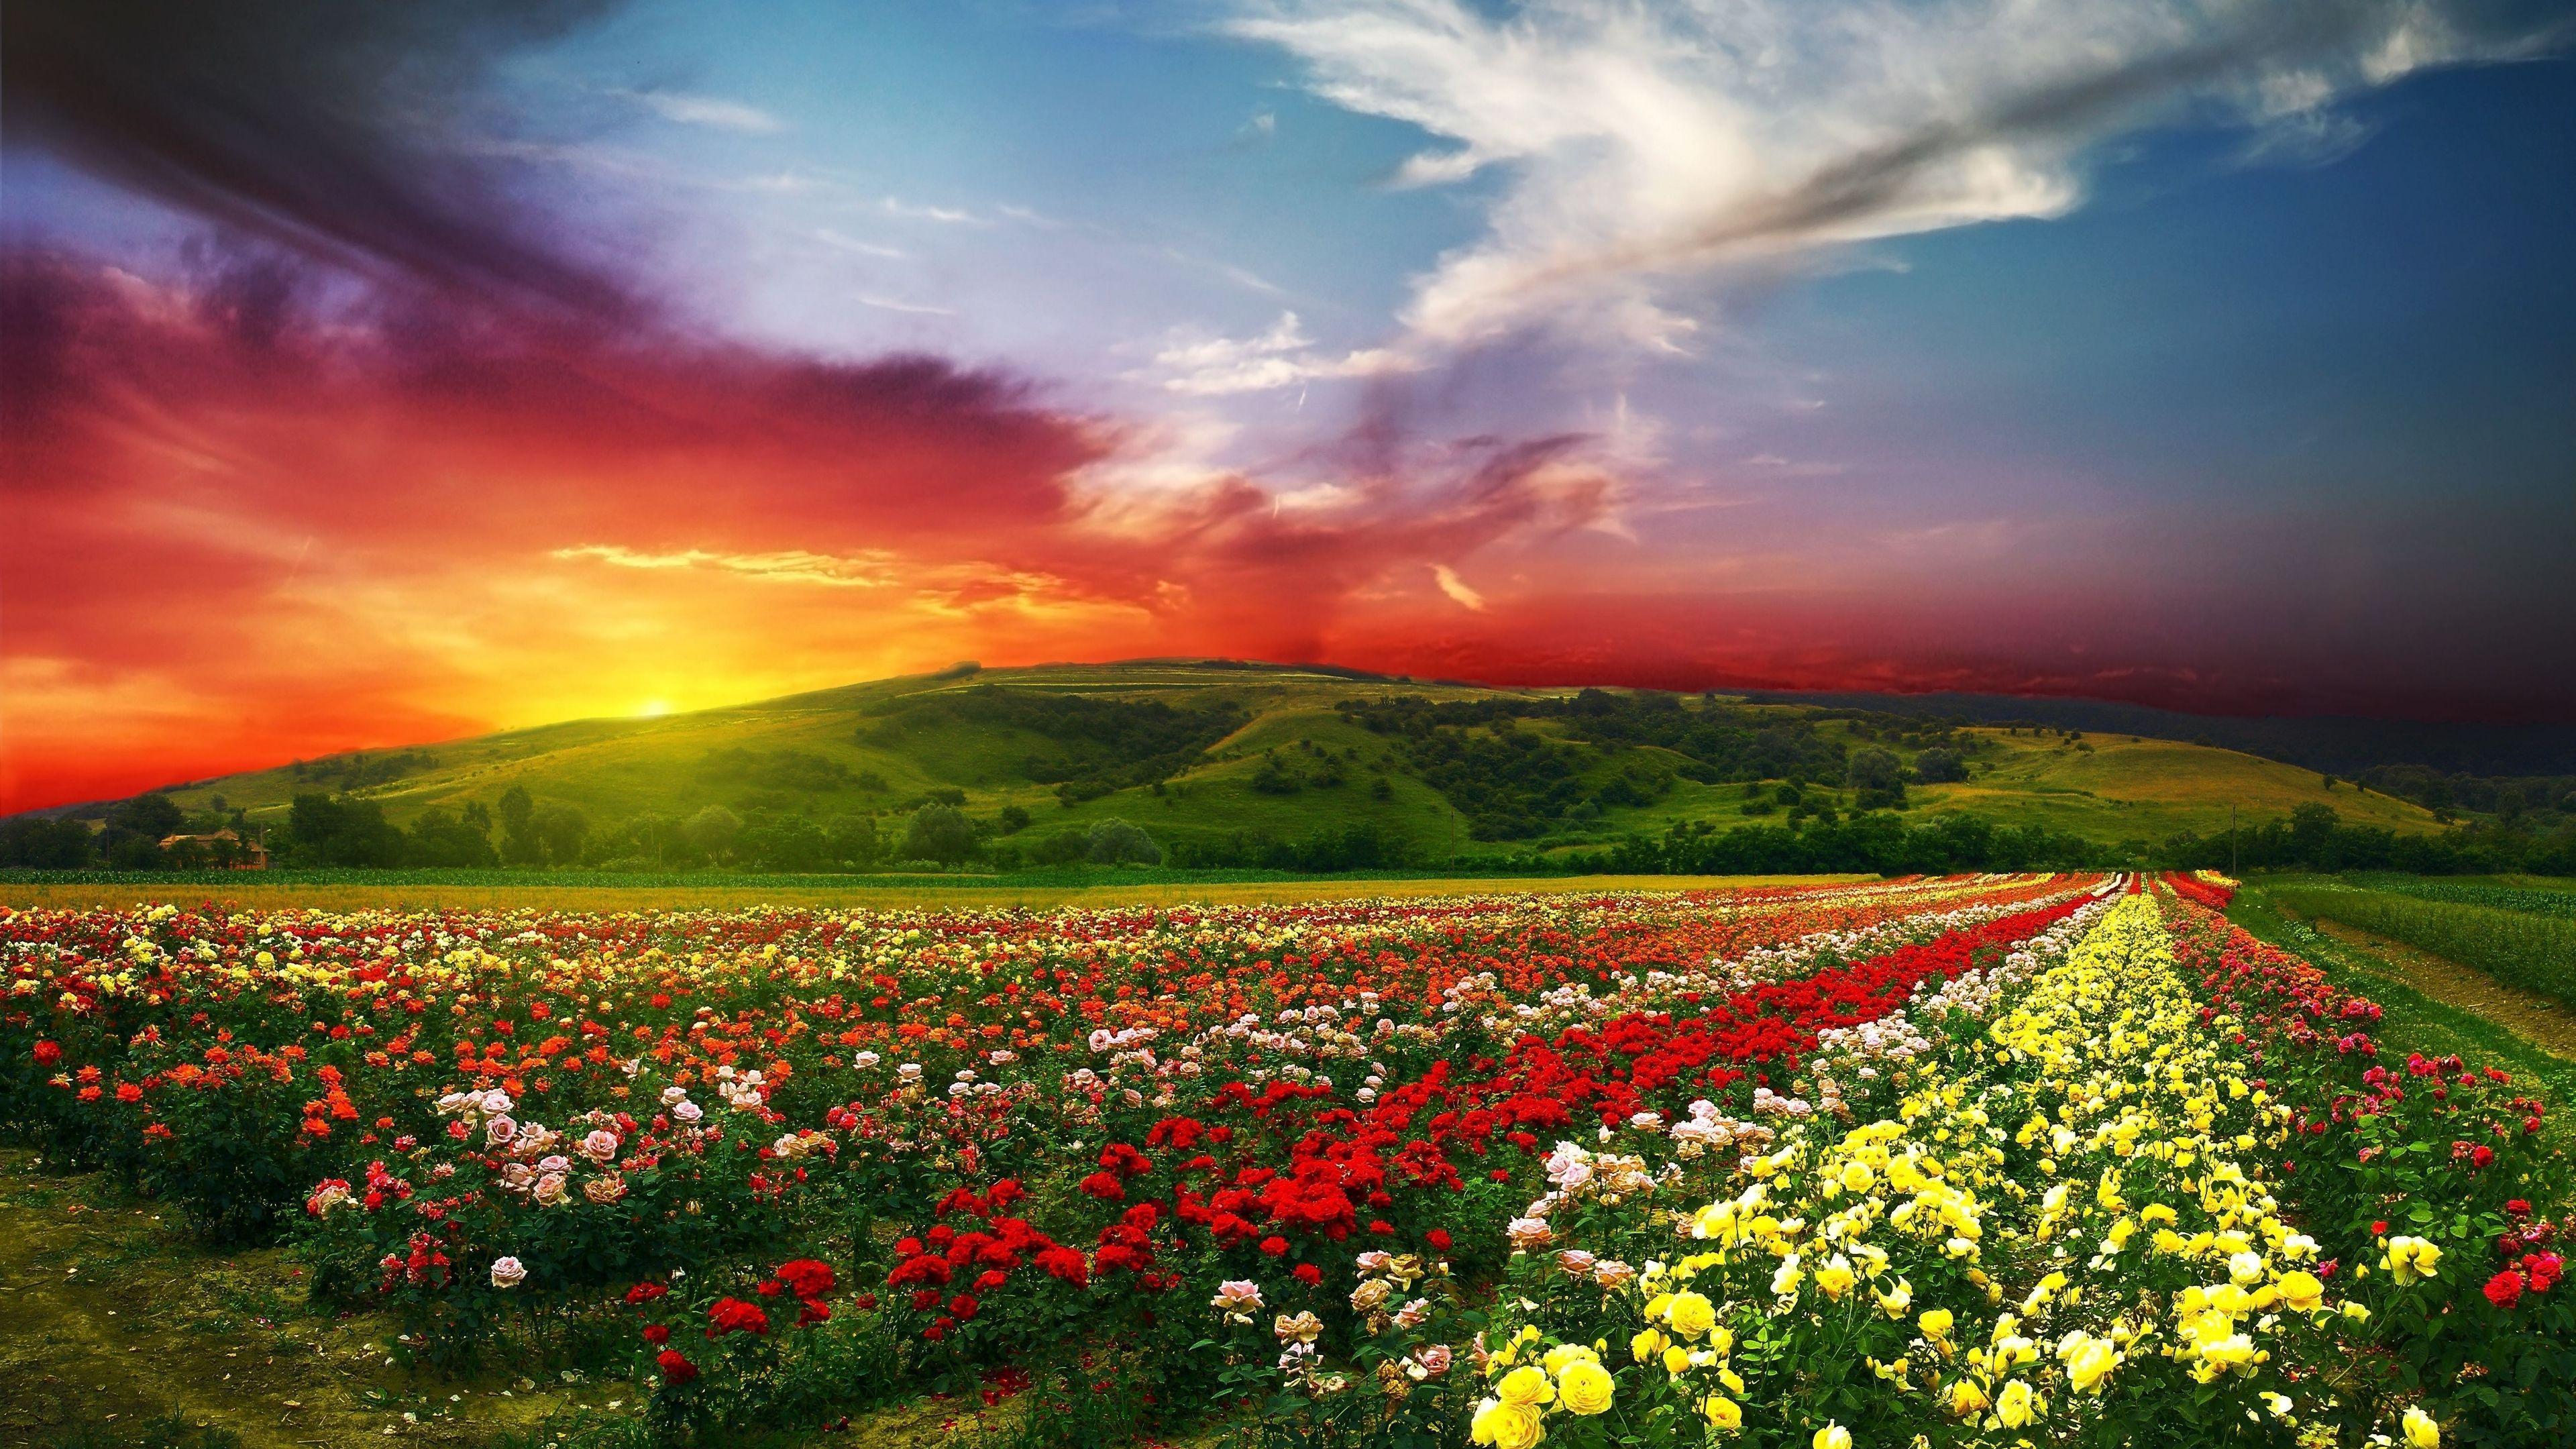 Flowers 4k Wallpapers Top Free Flowers 4k Backgrounds